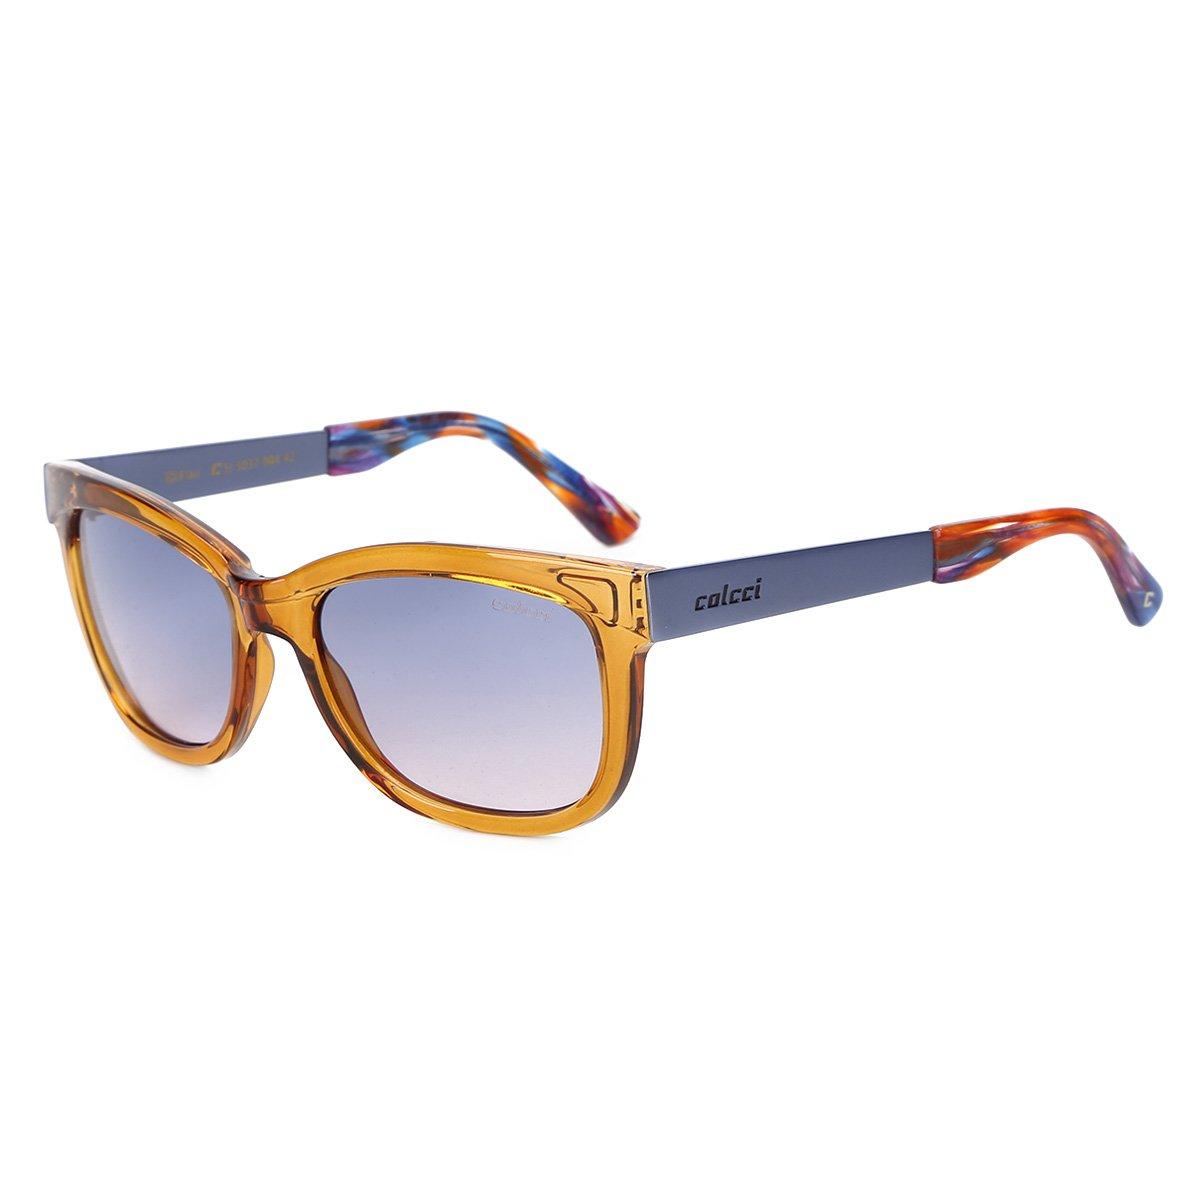 07b8f86a8 Óculos de Sol Colcci Flair 05037 Feminino - Azul | Netshoes